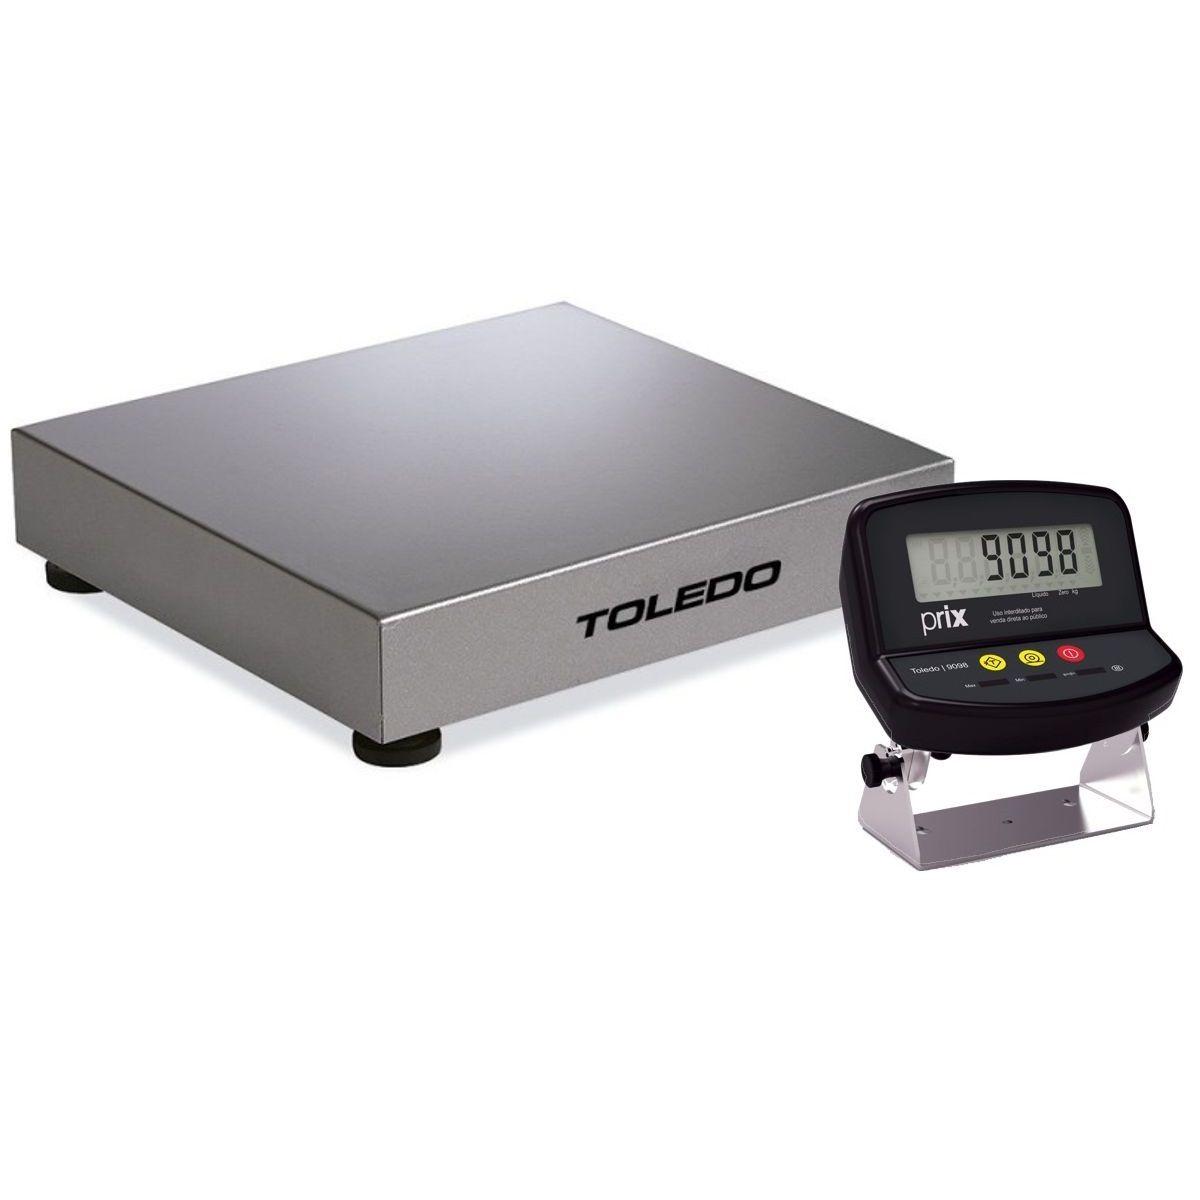 Balança de Plataforma Toledo 2098 (60Kgx10g) (37,5x42,5cm)